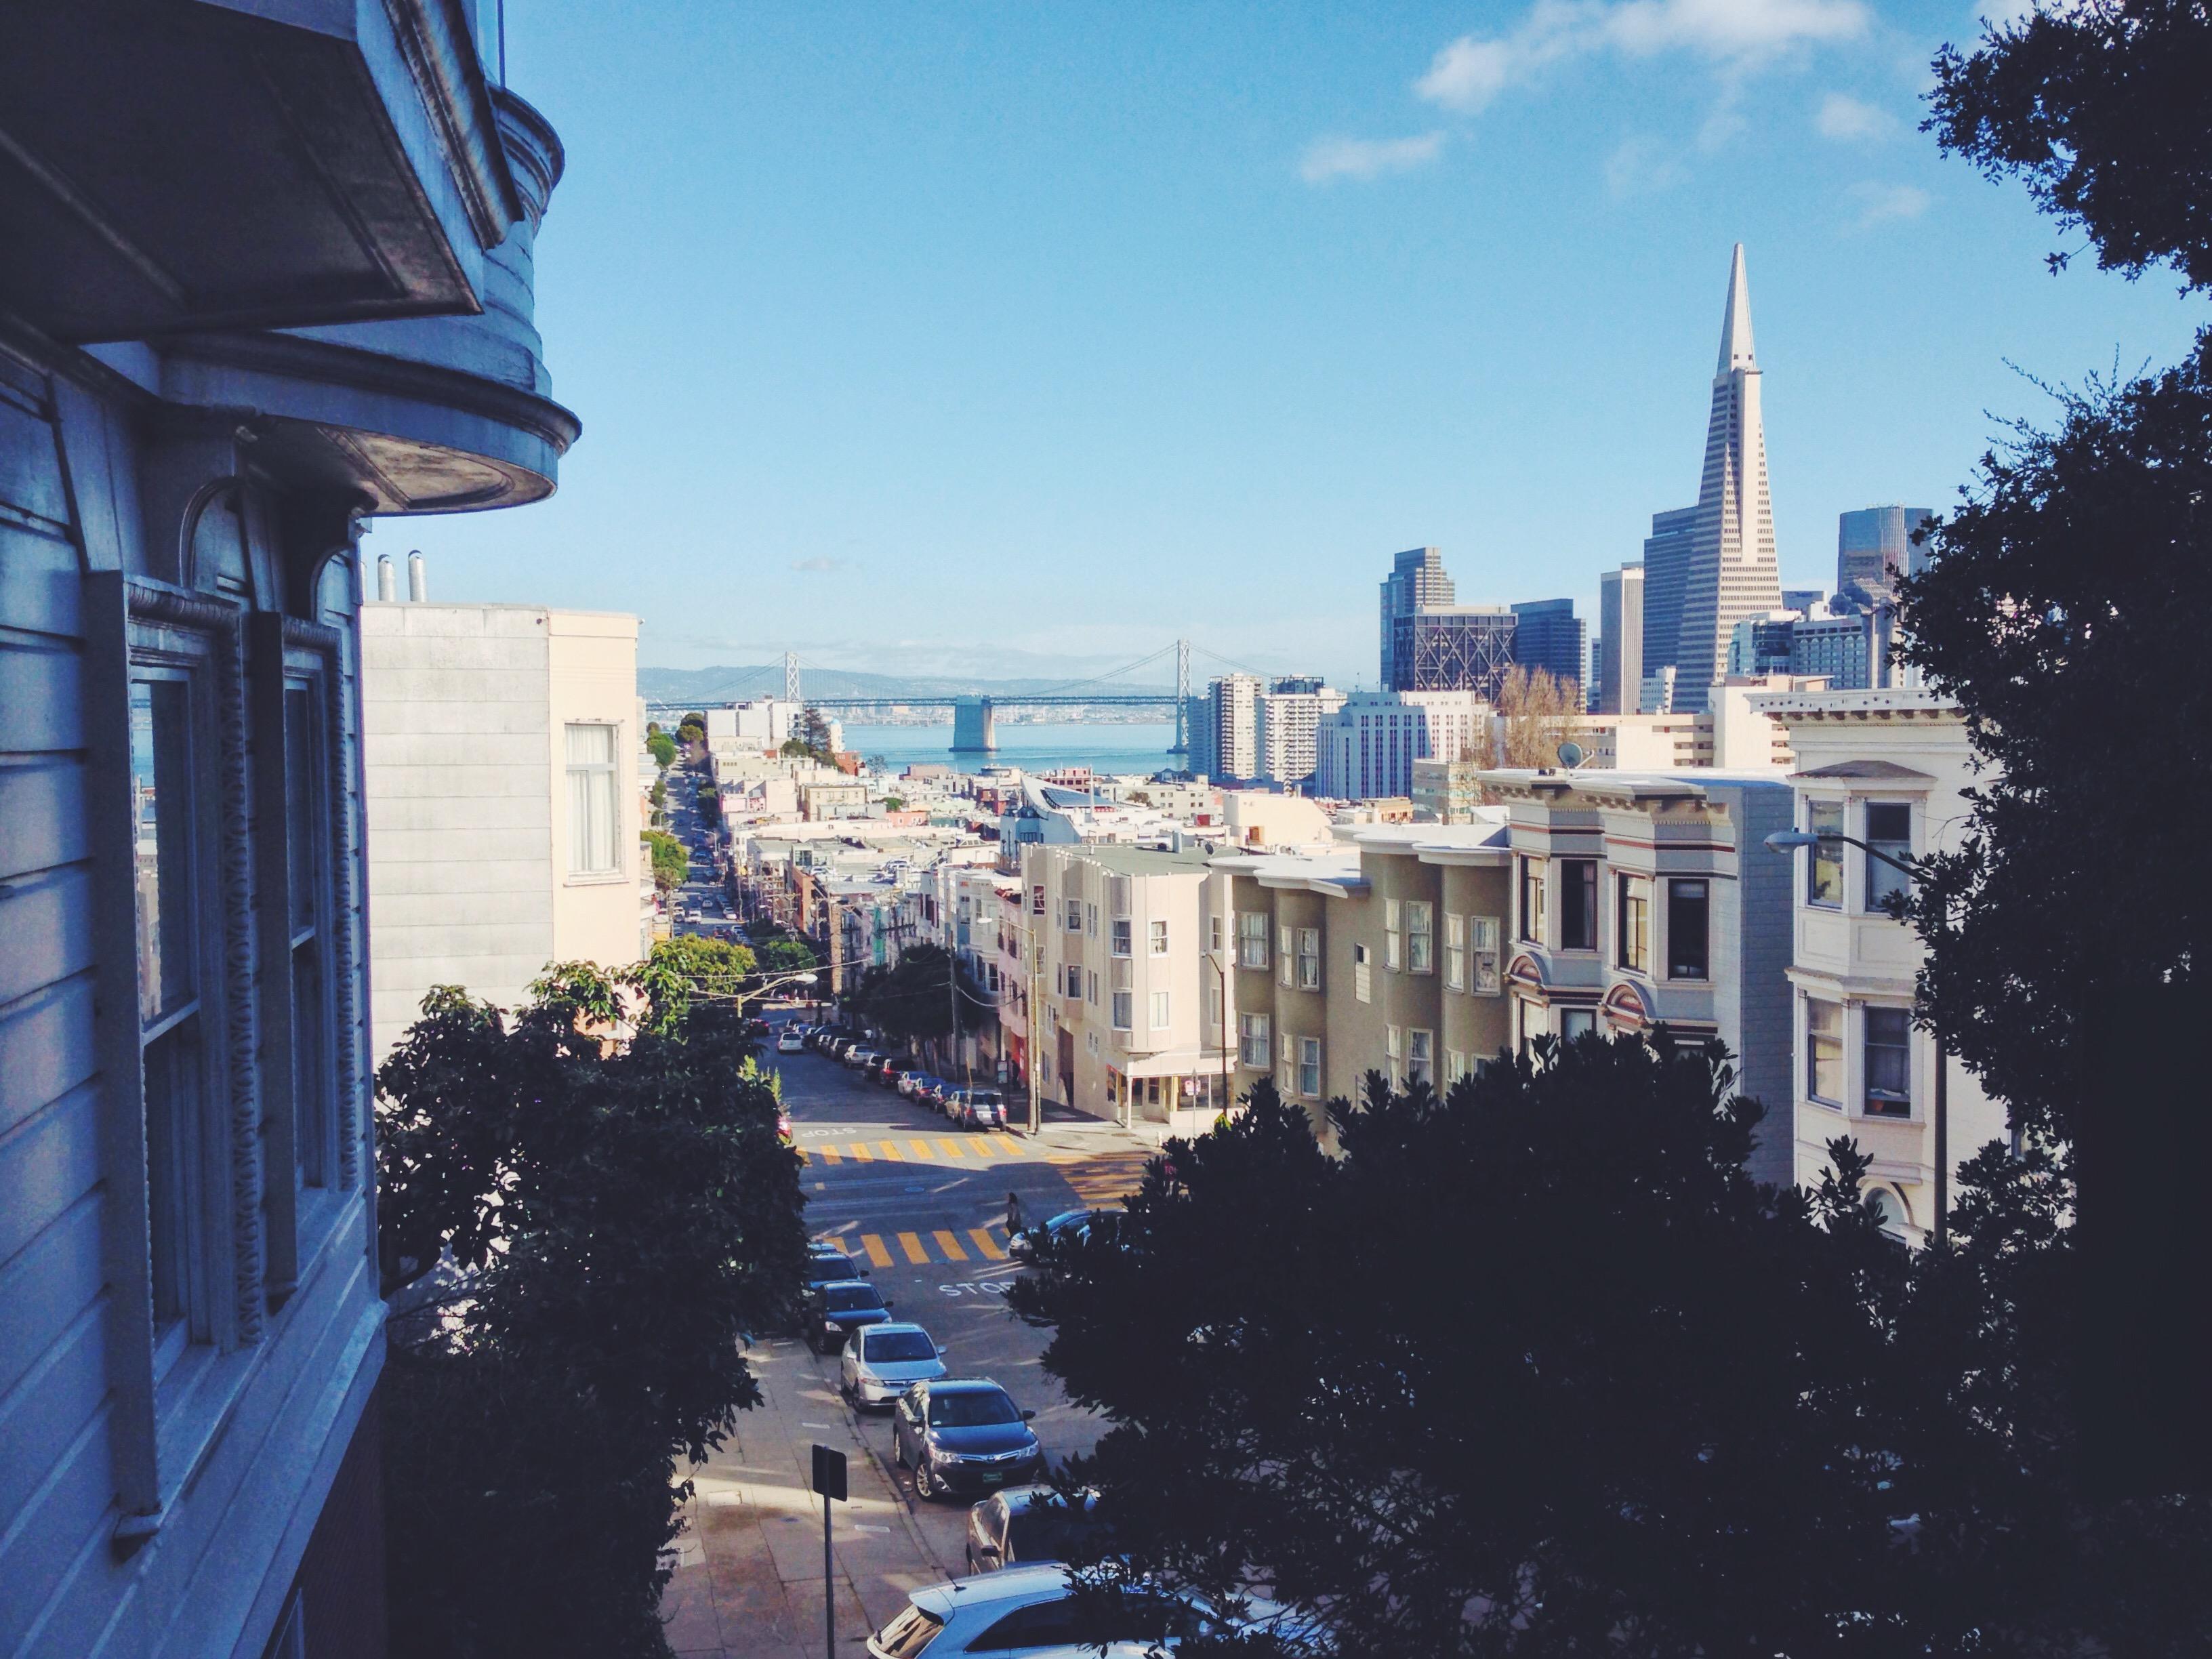 Le strade in discesa di San Francisco